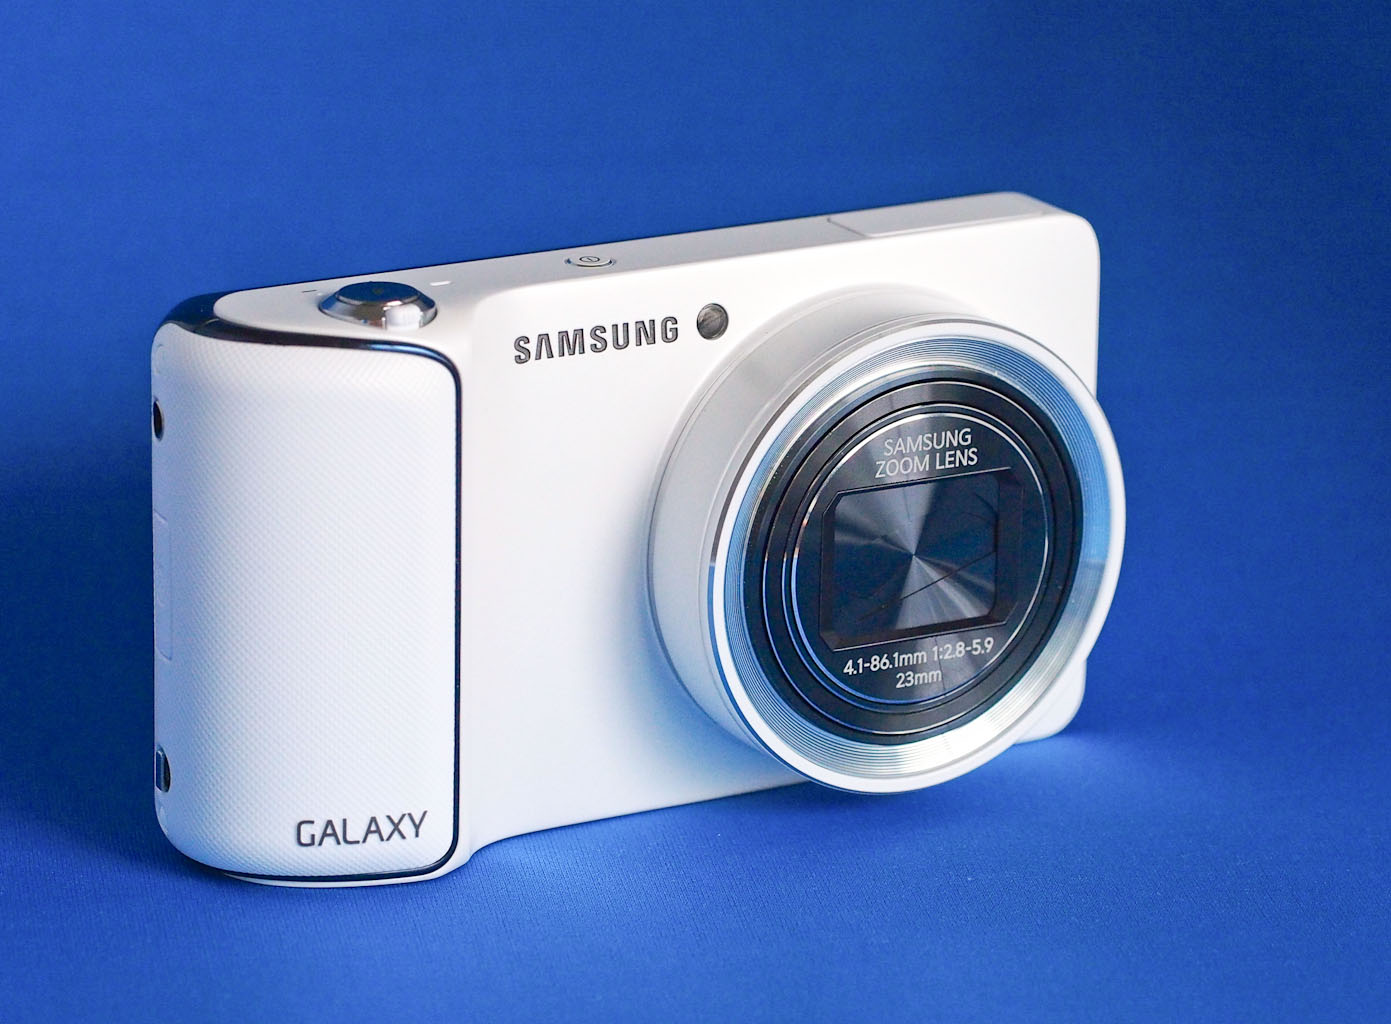 http://thedigitalstory.com/2013/06/20/samsung-galaxy-front.jpg